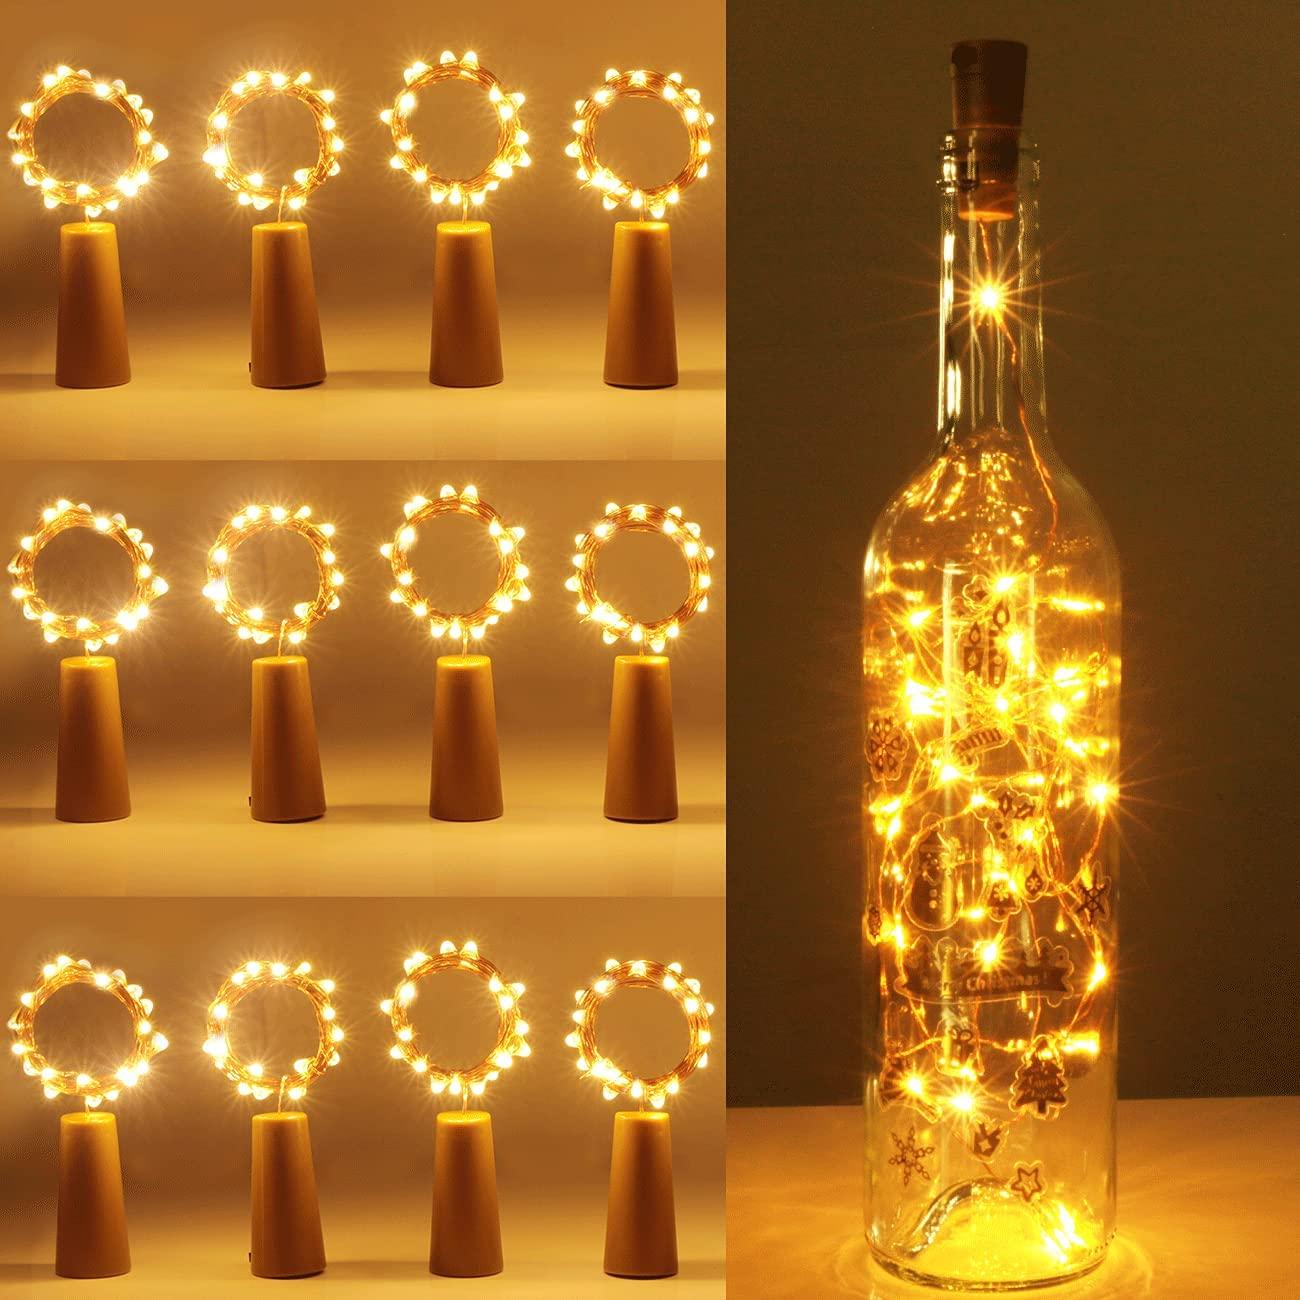 Halloween garden bottle light decoration-uptodatedaily